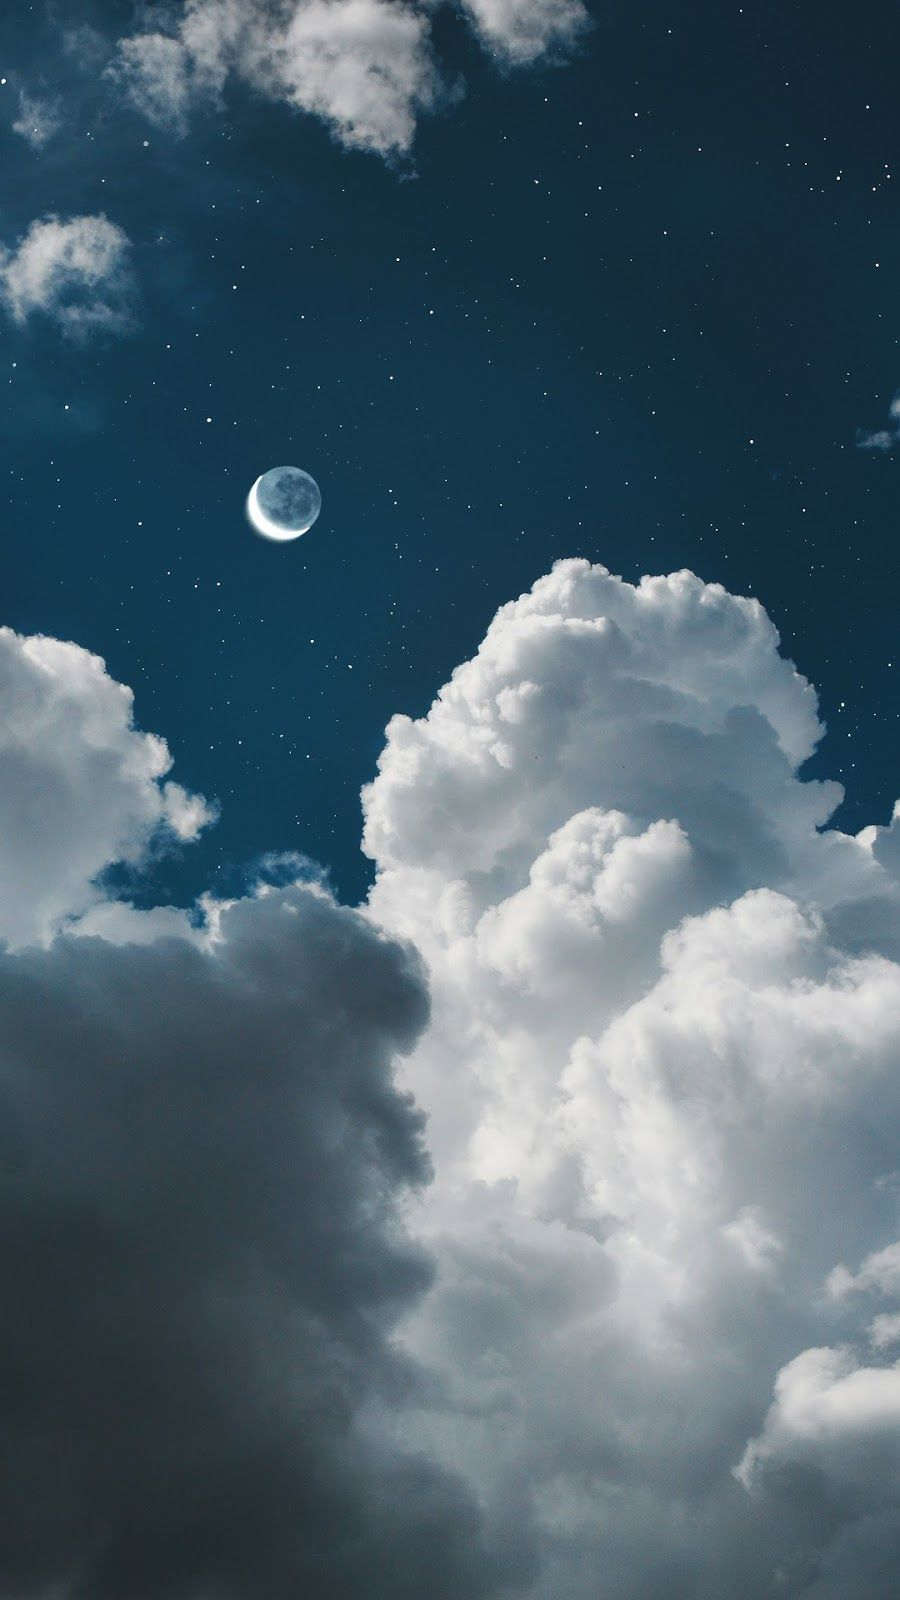 two moon cellphone wallpaper